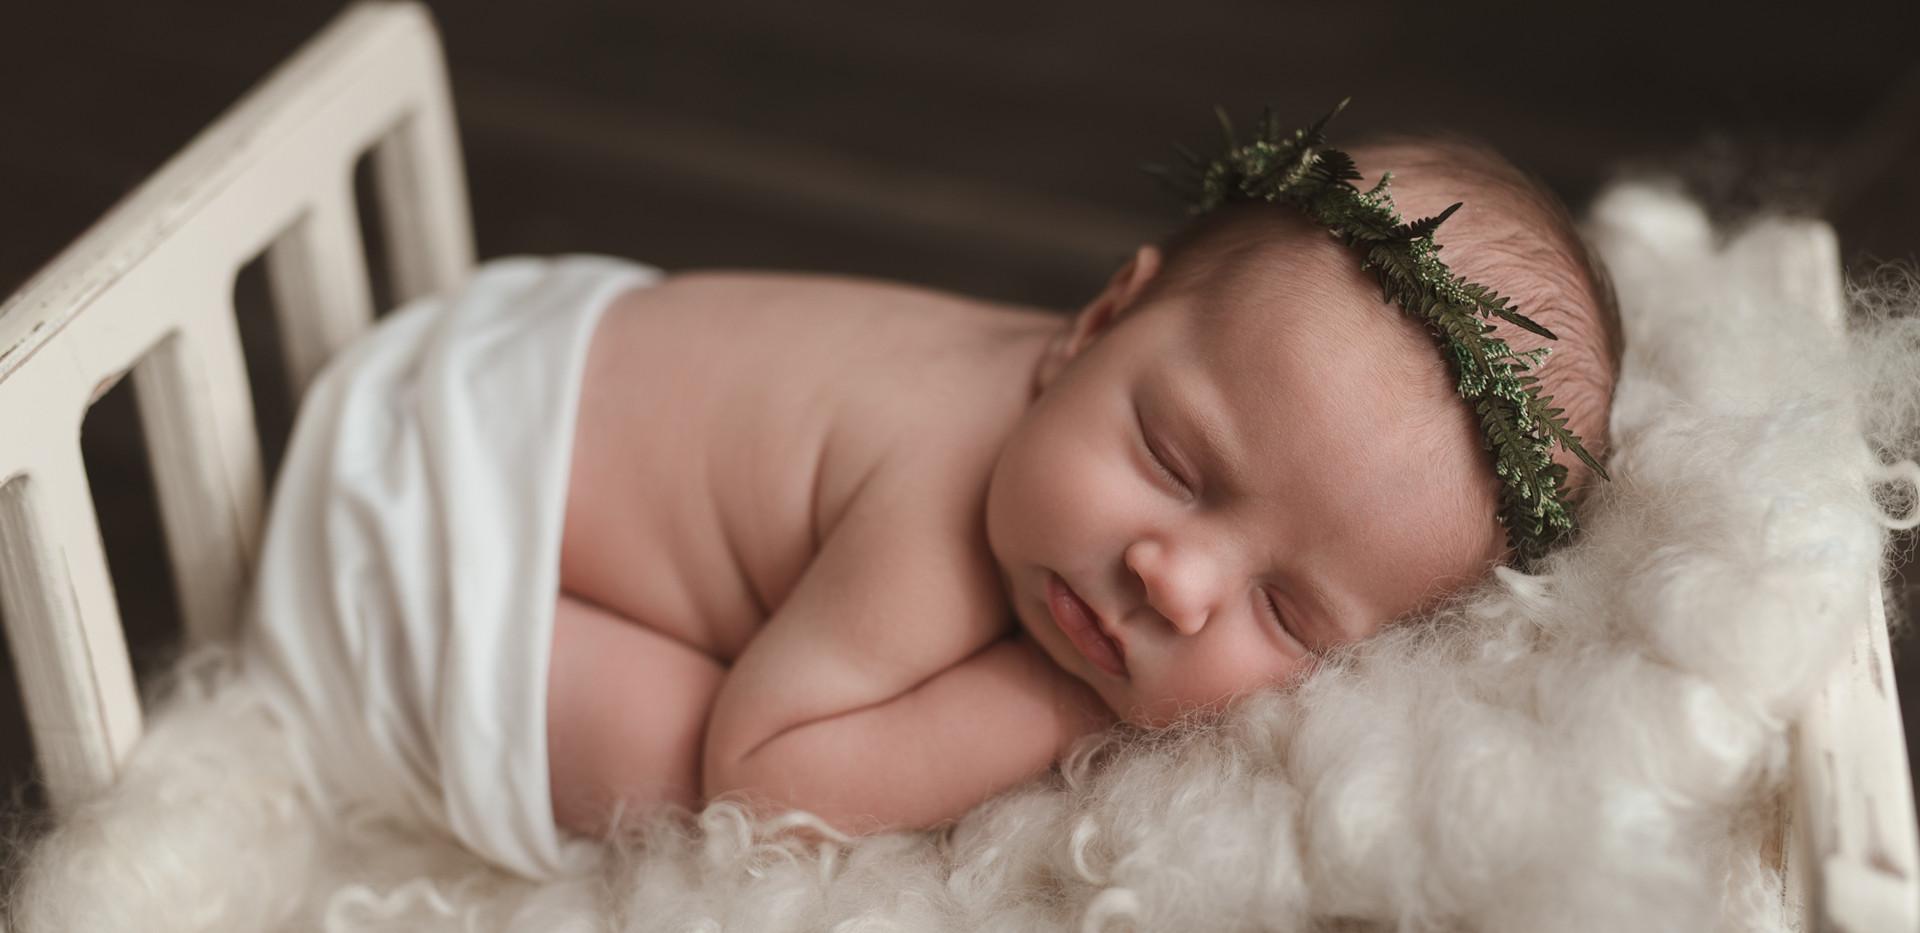 Amsterdam Newborn baby photos.jpg